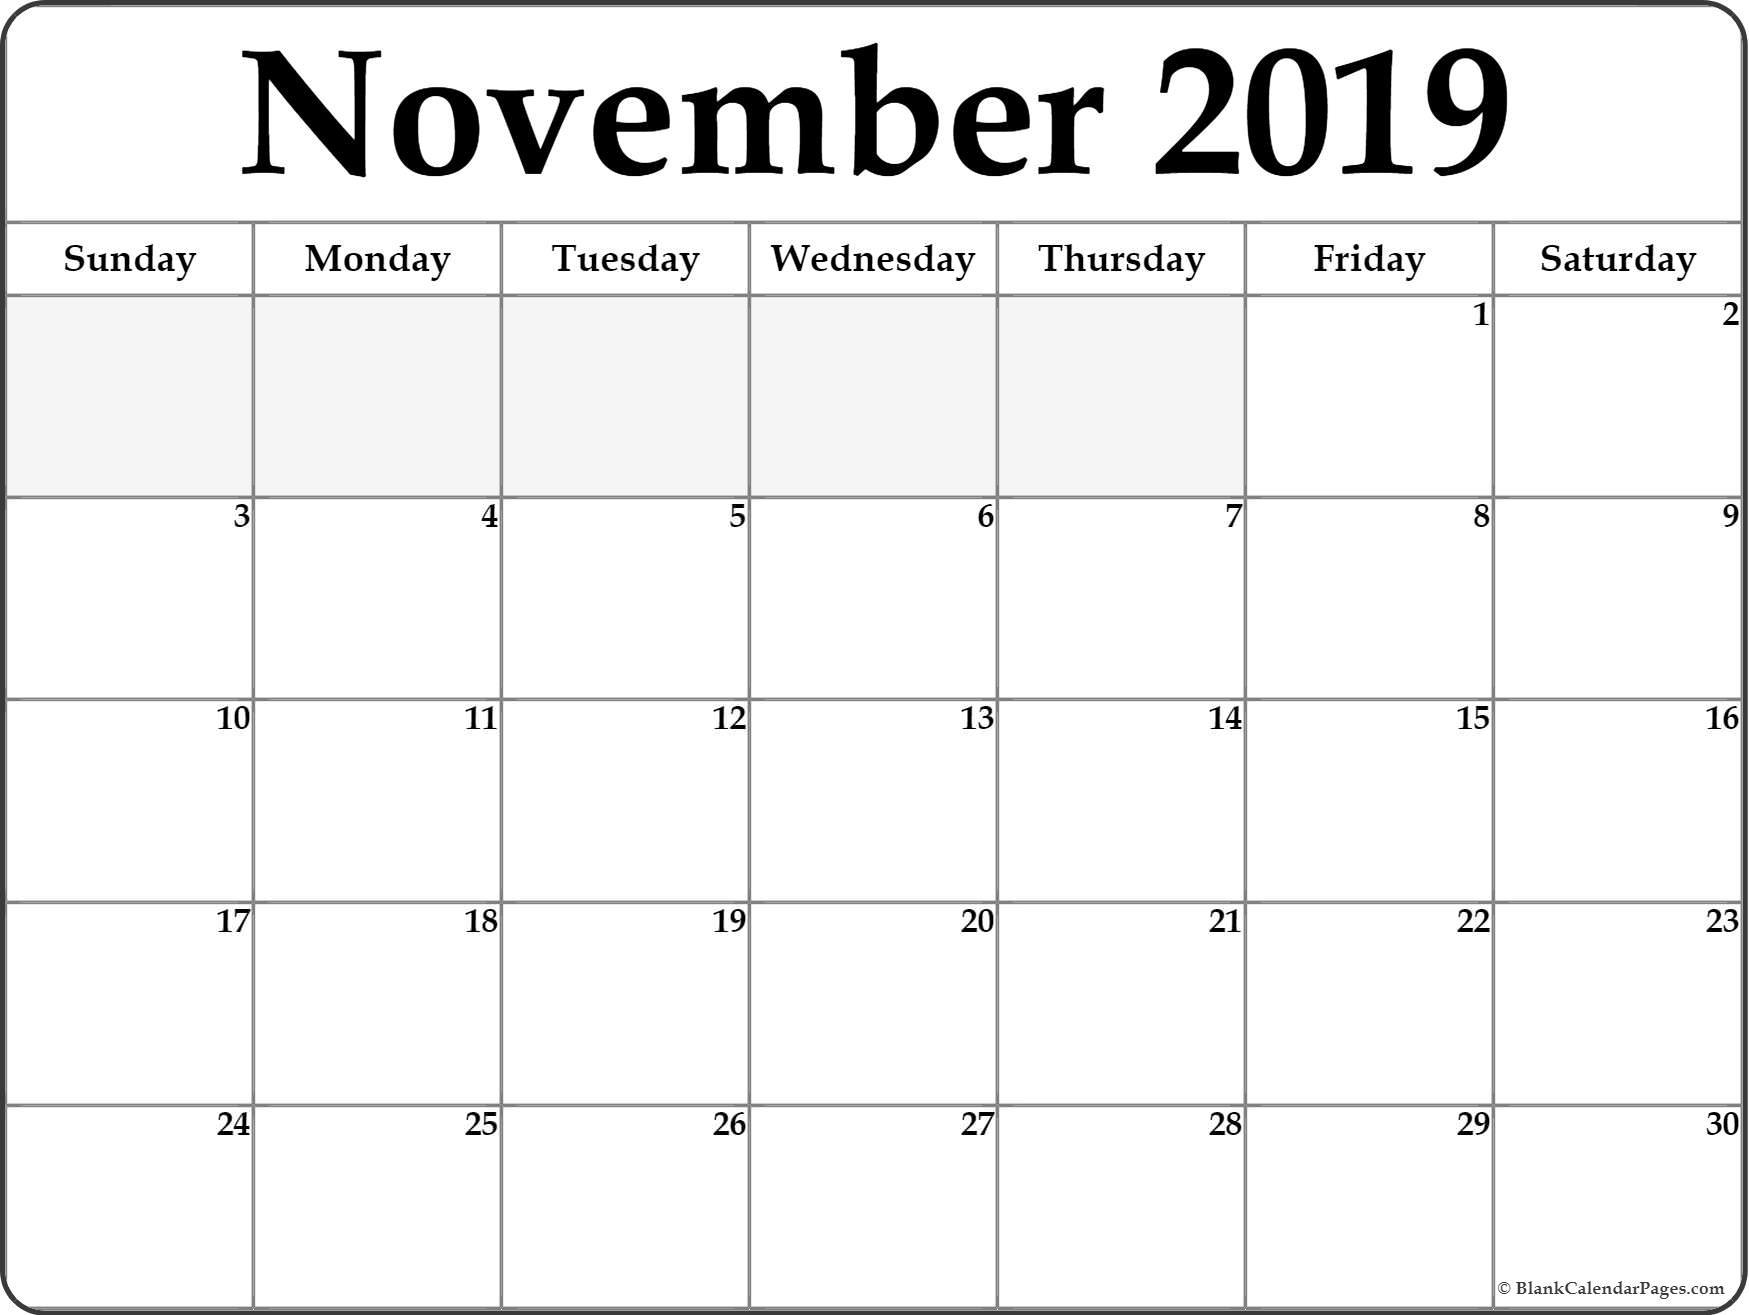 Editable November 2019 Printable Calendar - Word, Pdf, Excel in Fill In Calendar 2019 Printable